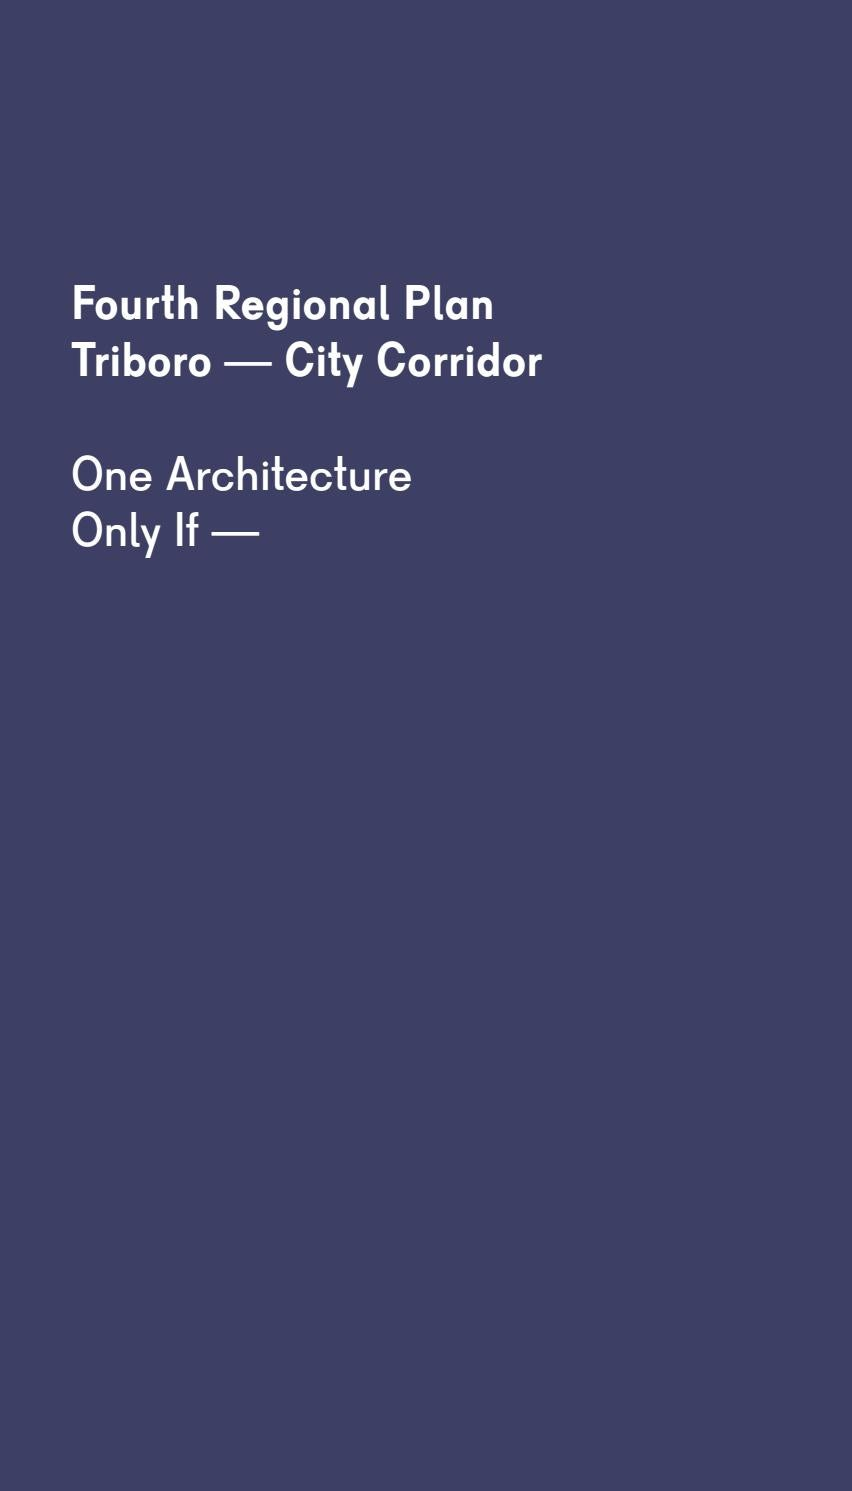 Triboro - City Corridor | Fourth Regional Plan by